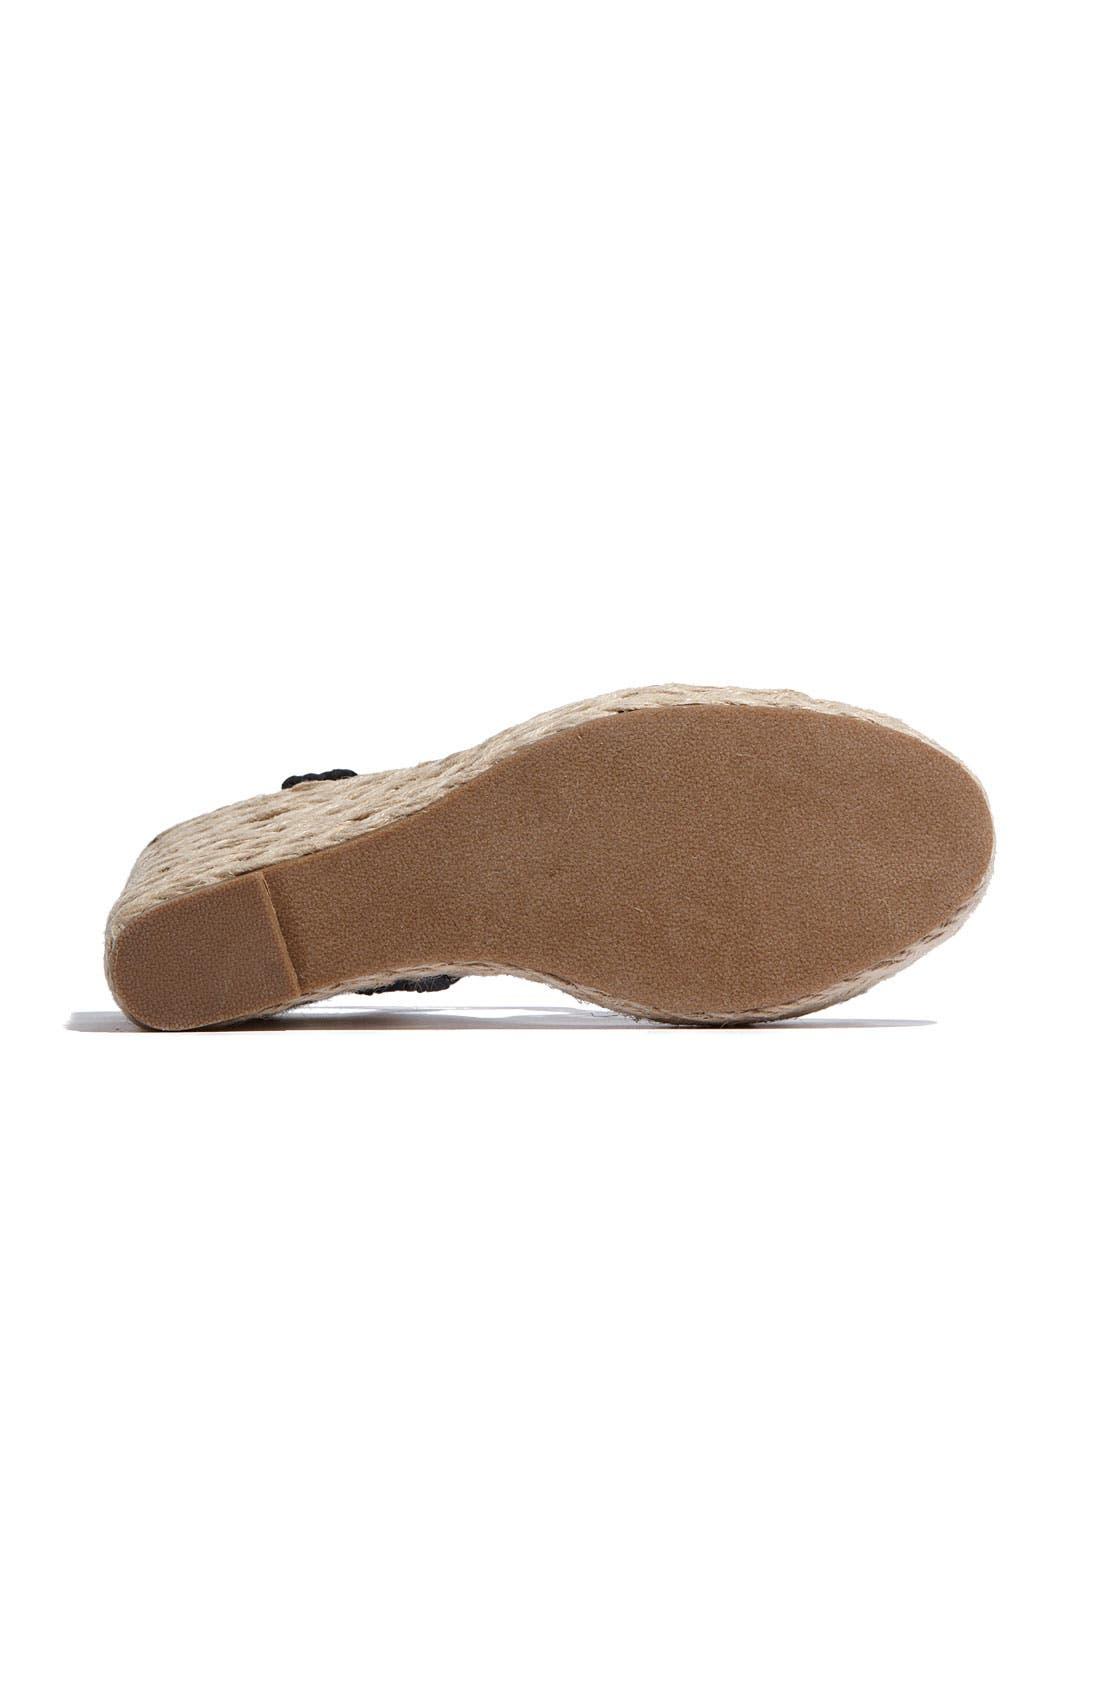 'Manngo' Woven Sandal,                             Alternate thumbnail 9, color,